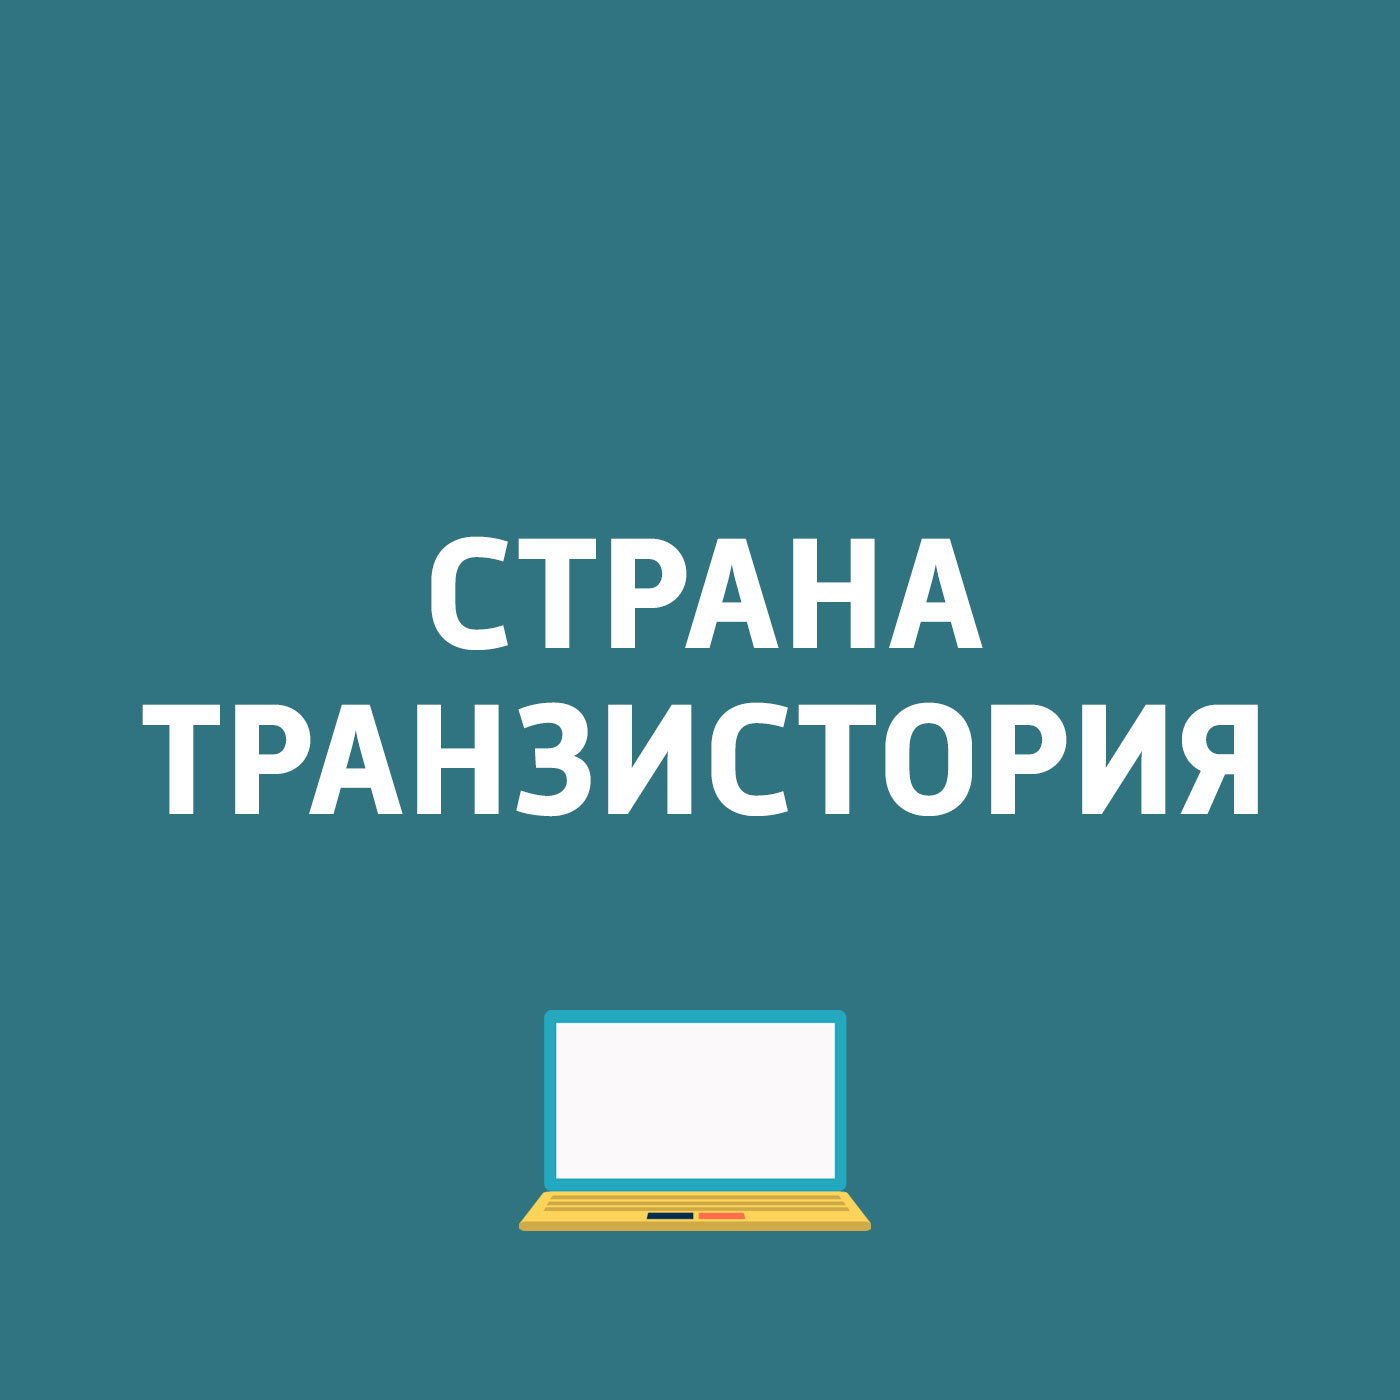 цена на Картаев Павел Oukitel K6000 Premium получит 6 ГБ ОЗУ. LeEco Le 2 лишится 3,5-мм разъема....